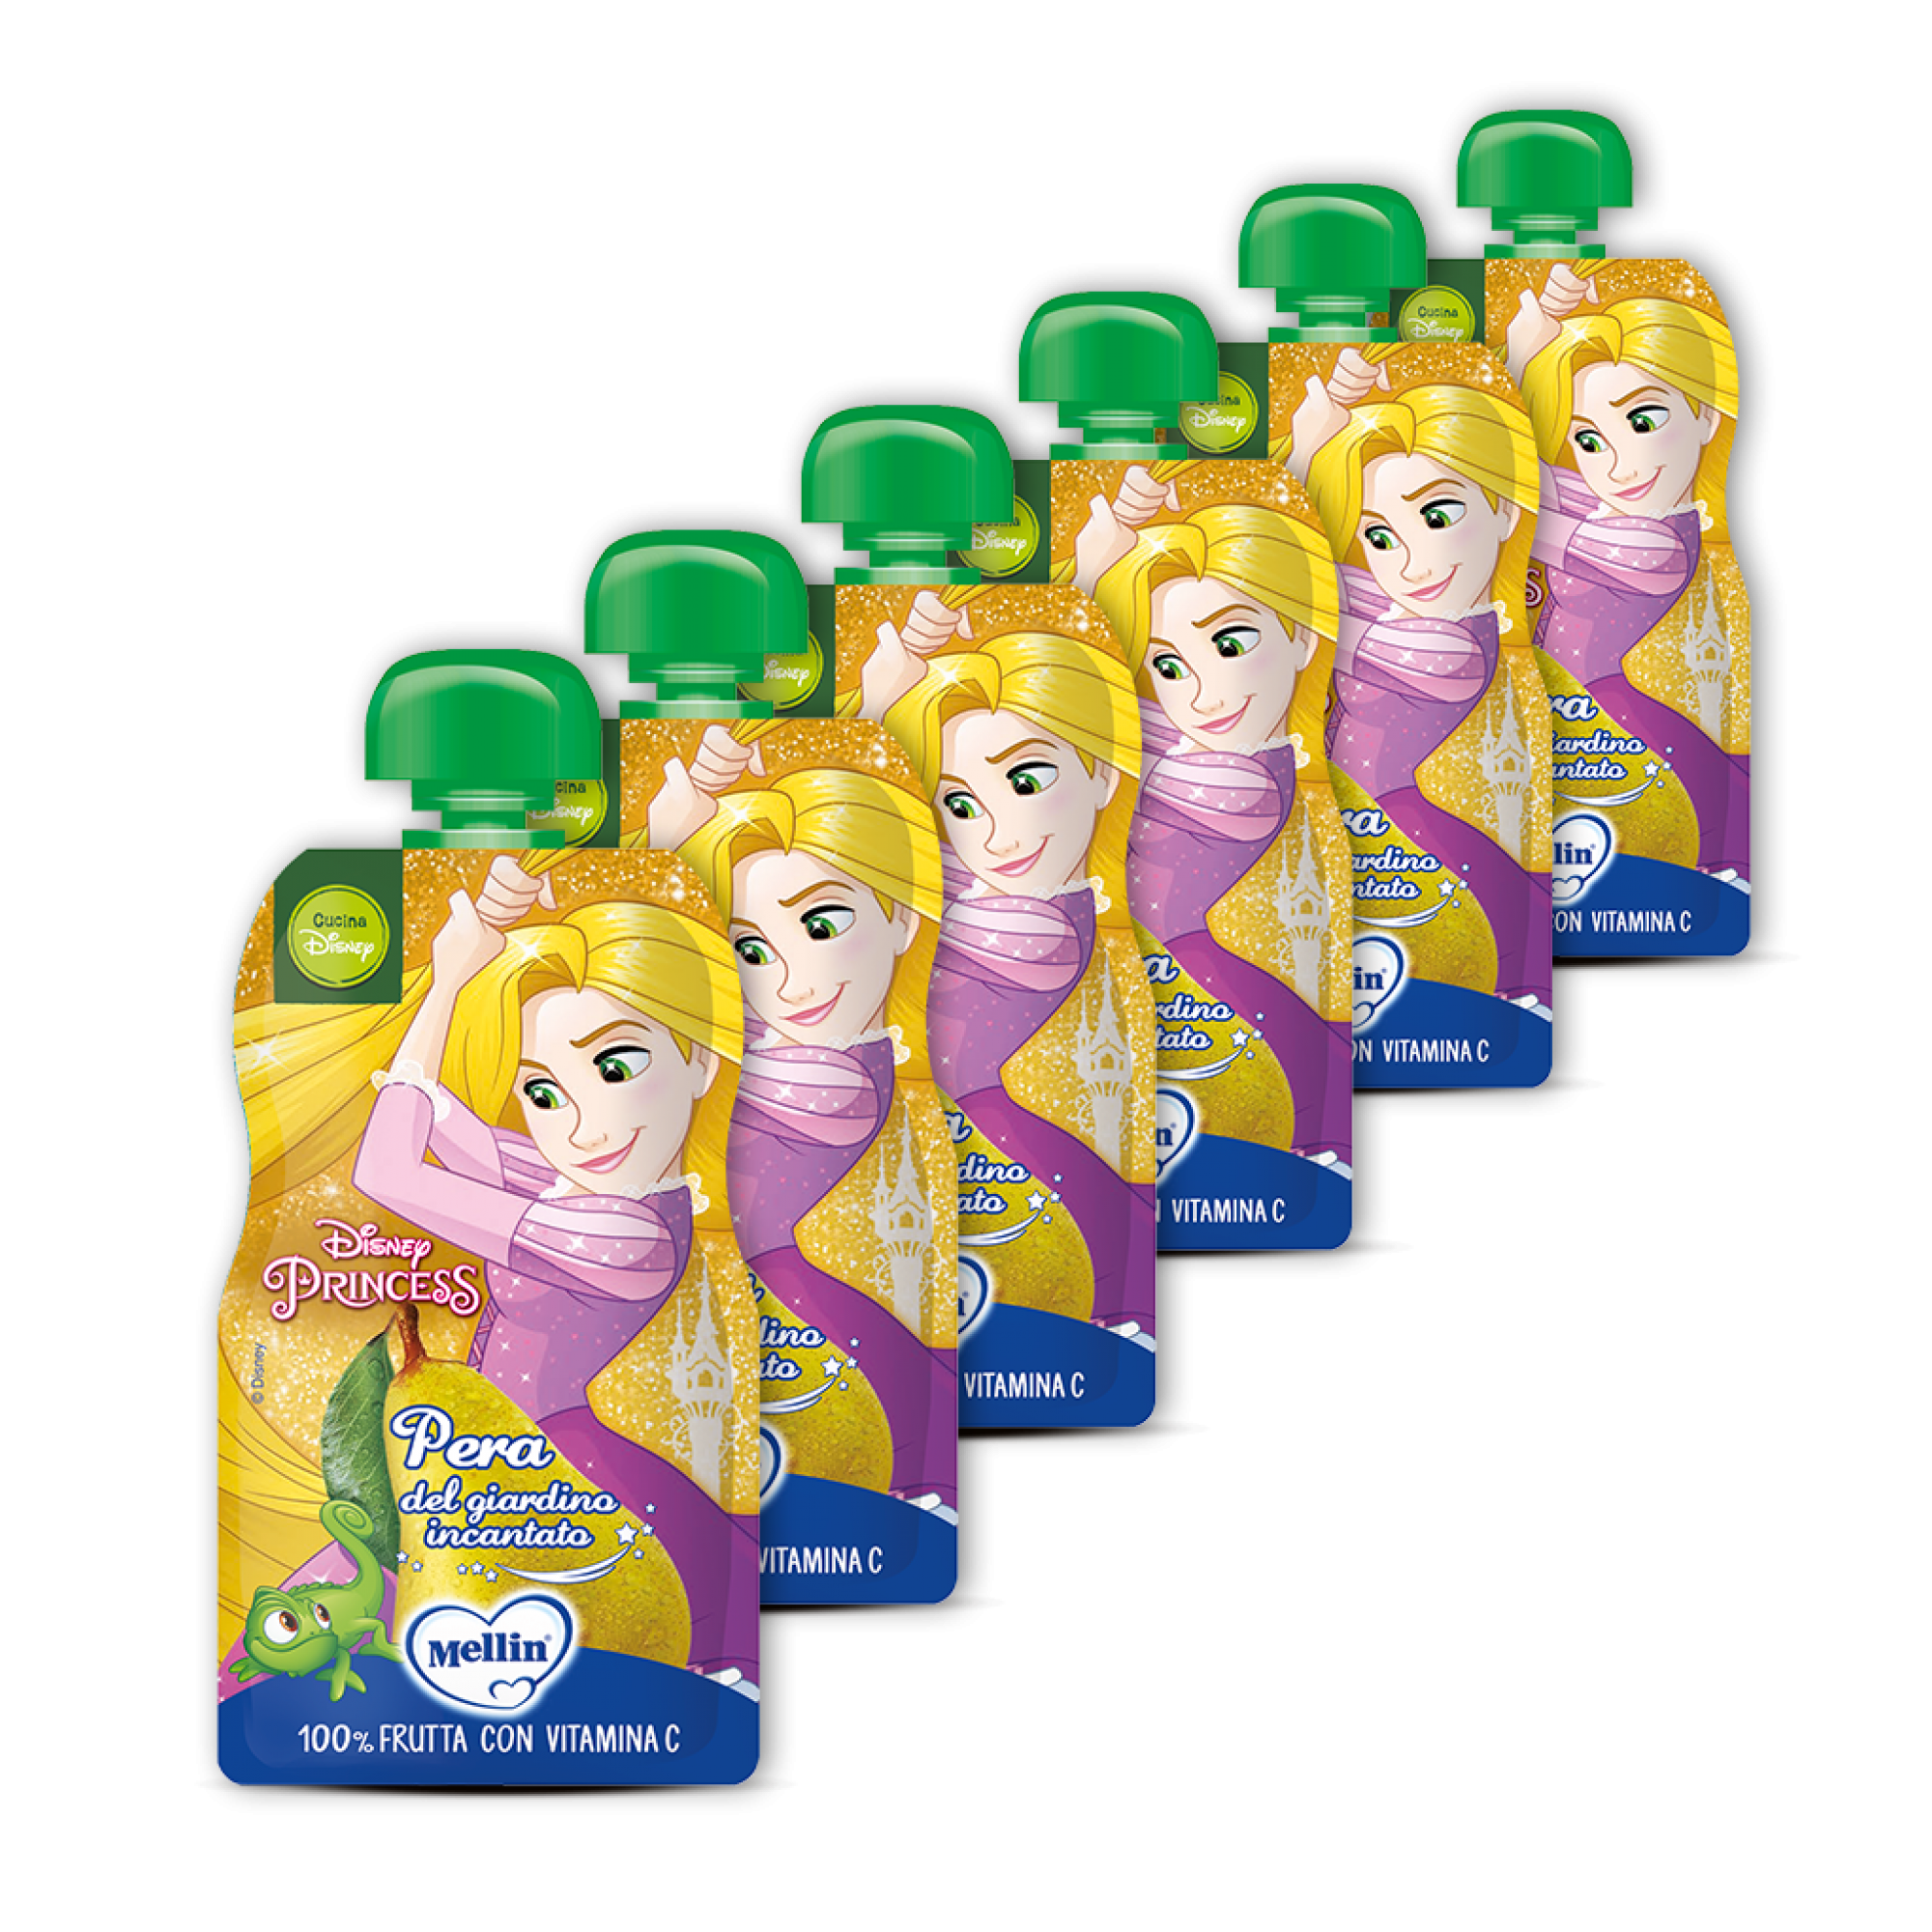 Pachet 6 x Mellin Piure de Pere Disney Princesses, 110g